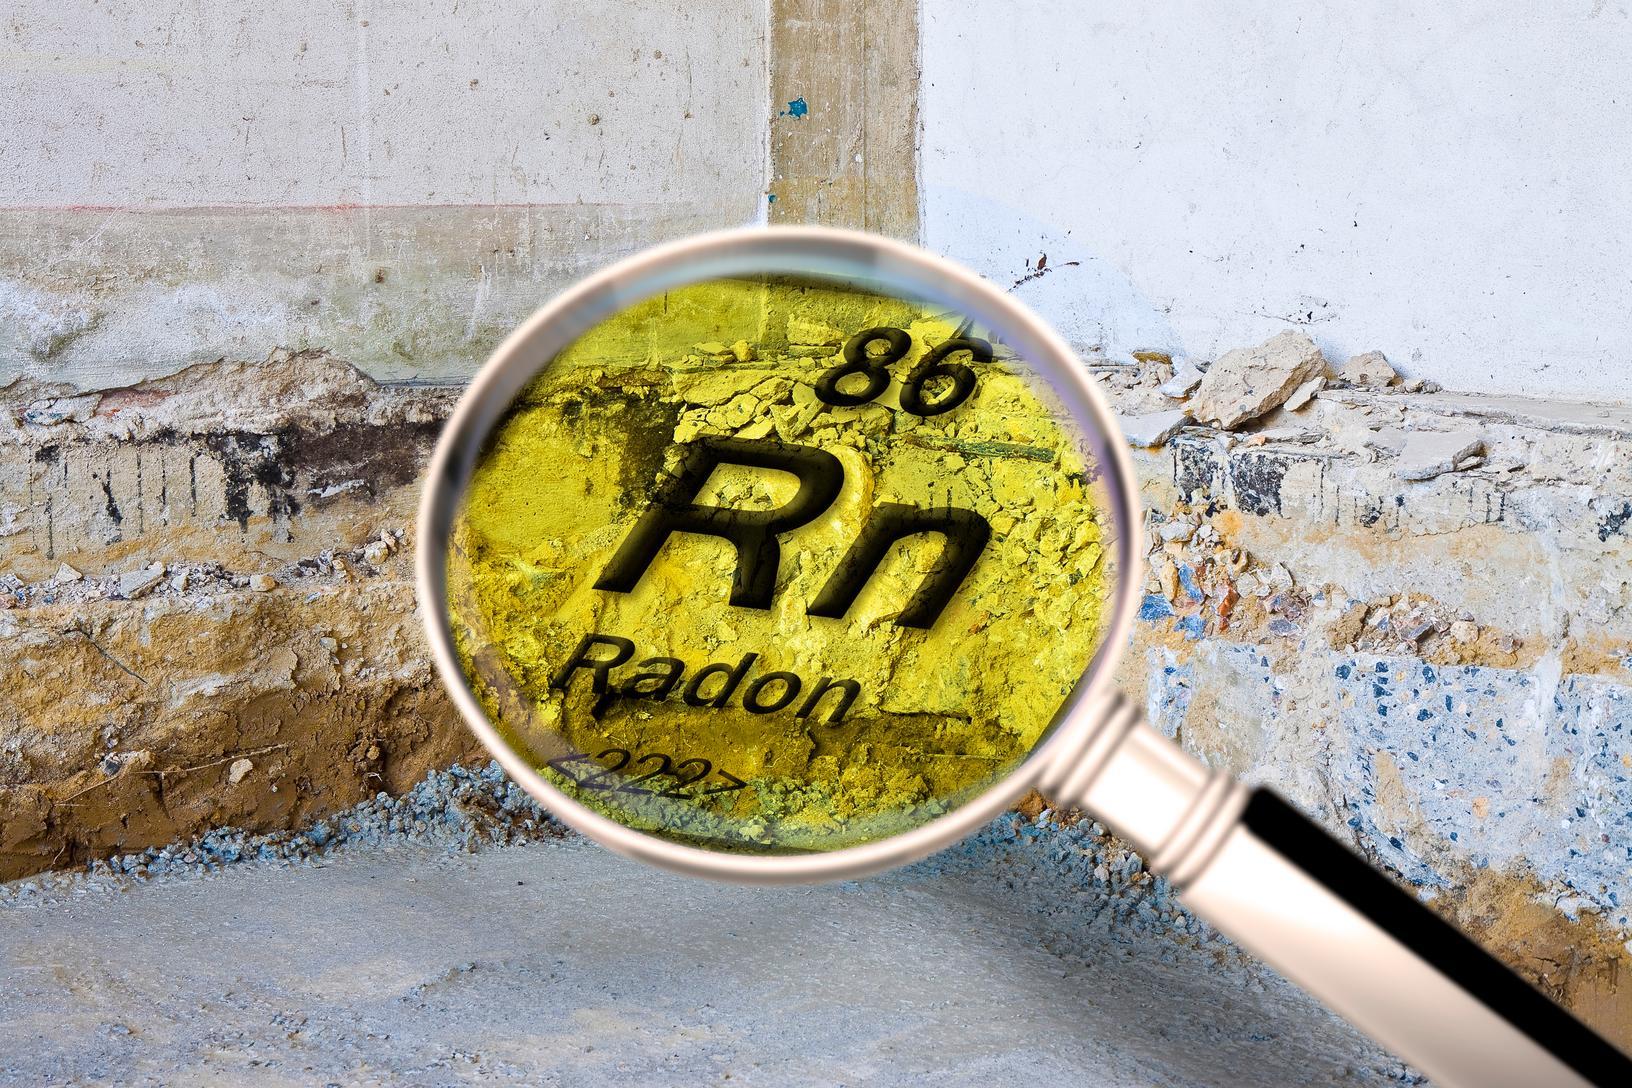 Radon Mitigation sales leads